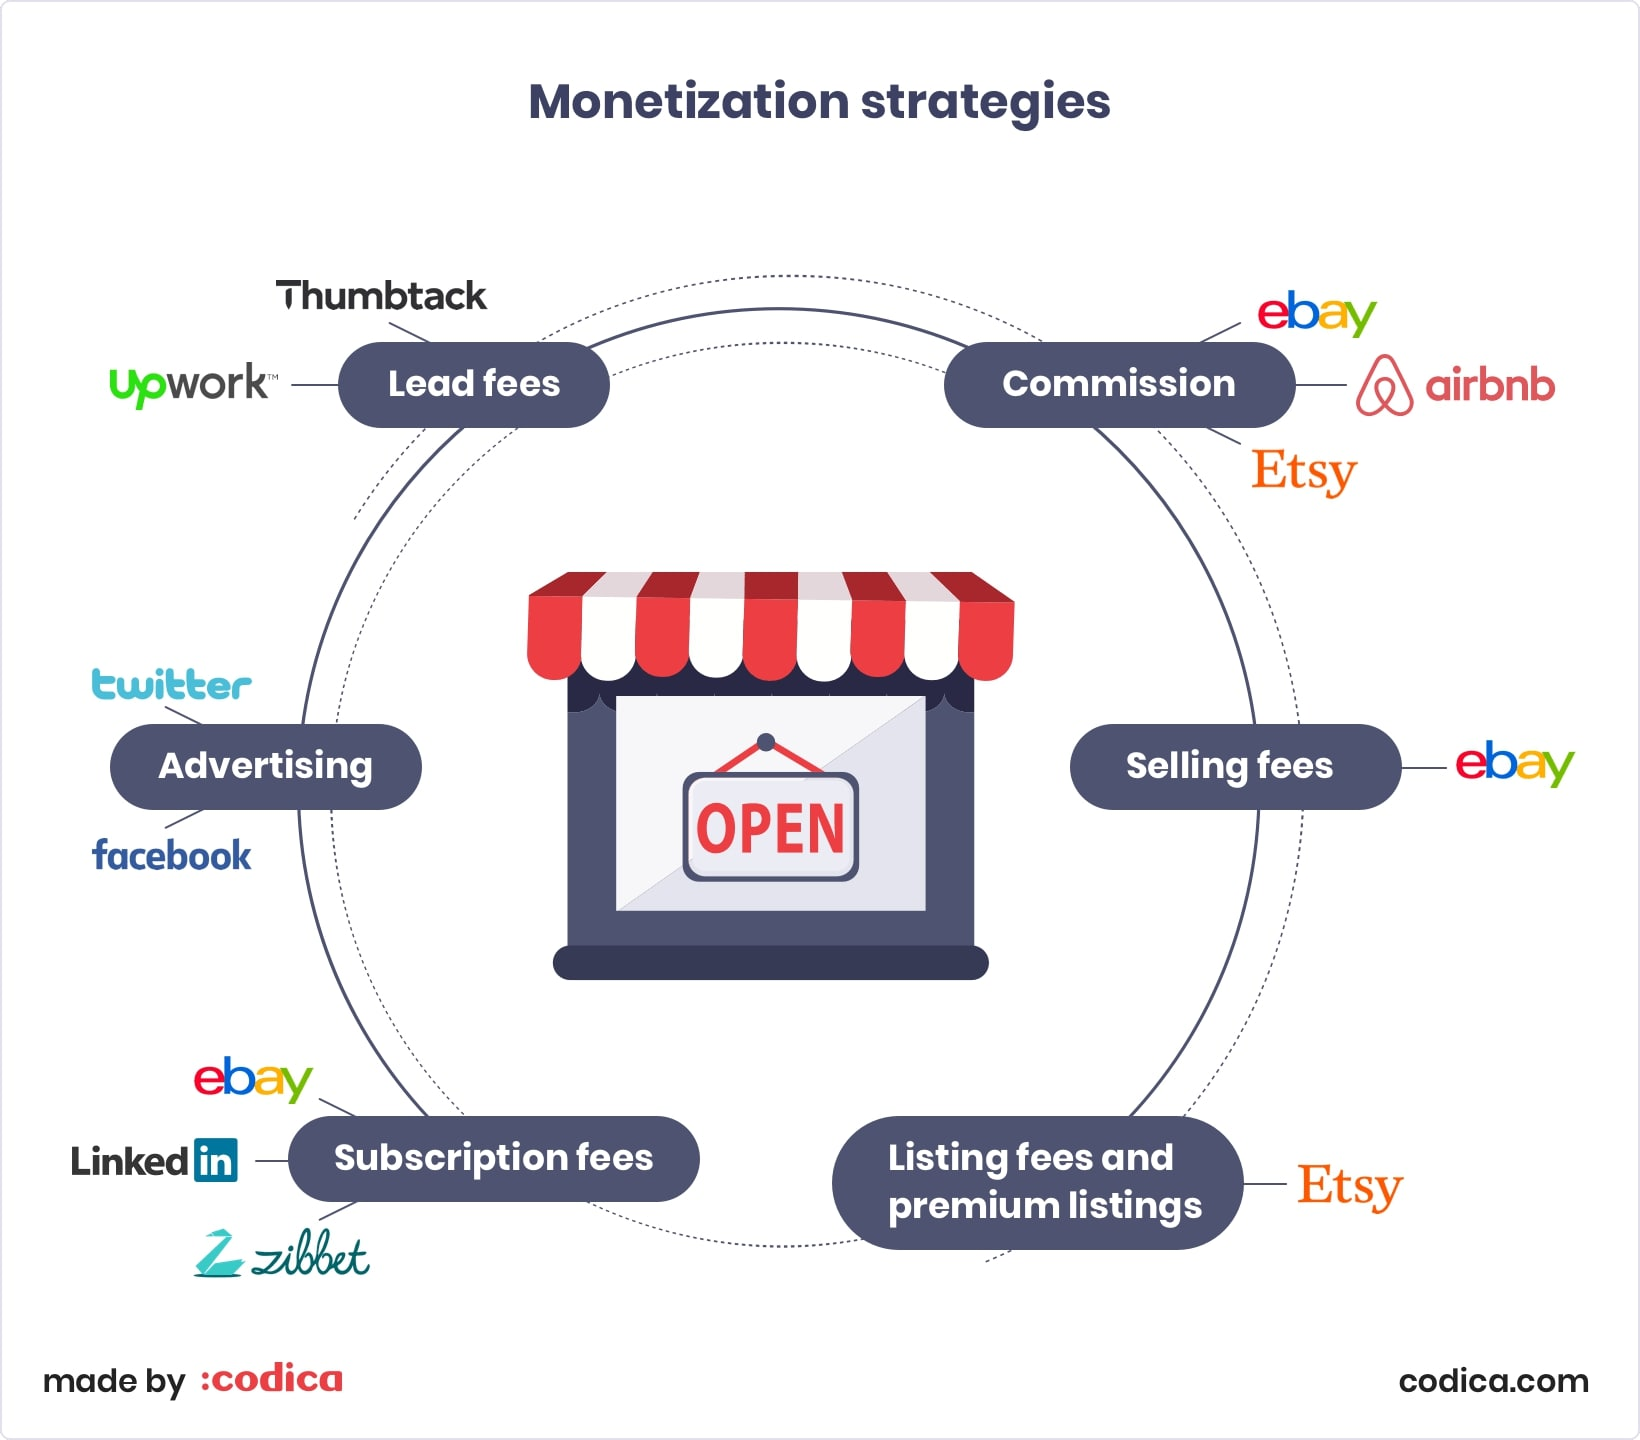 Monetization strategies for peer to peer marketplaces